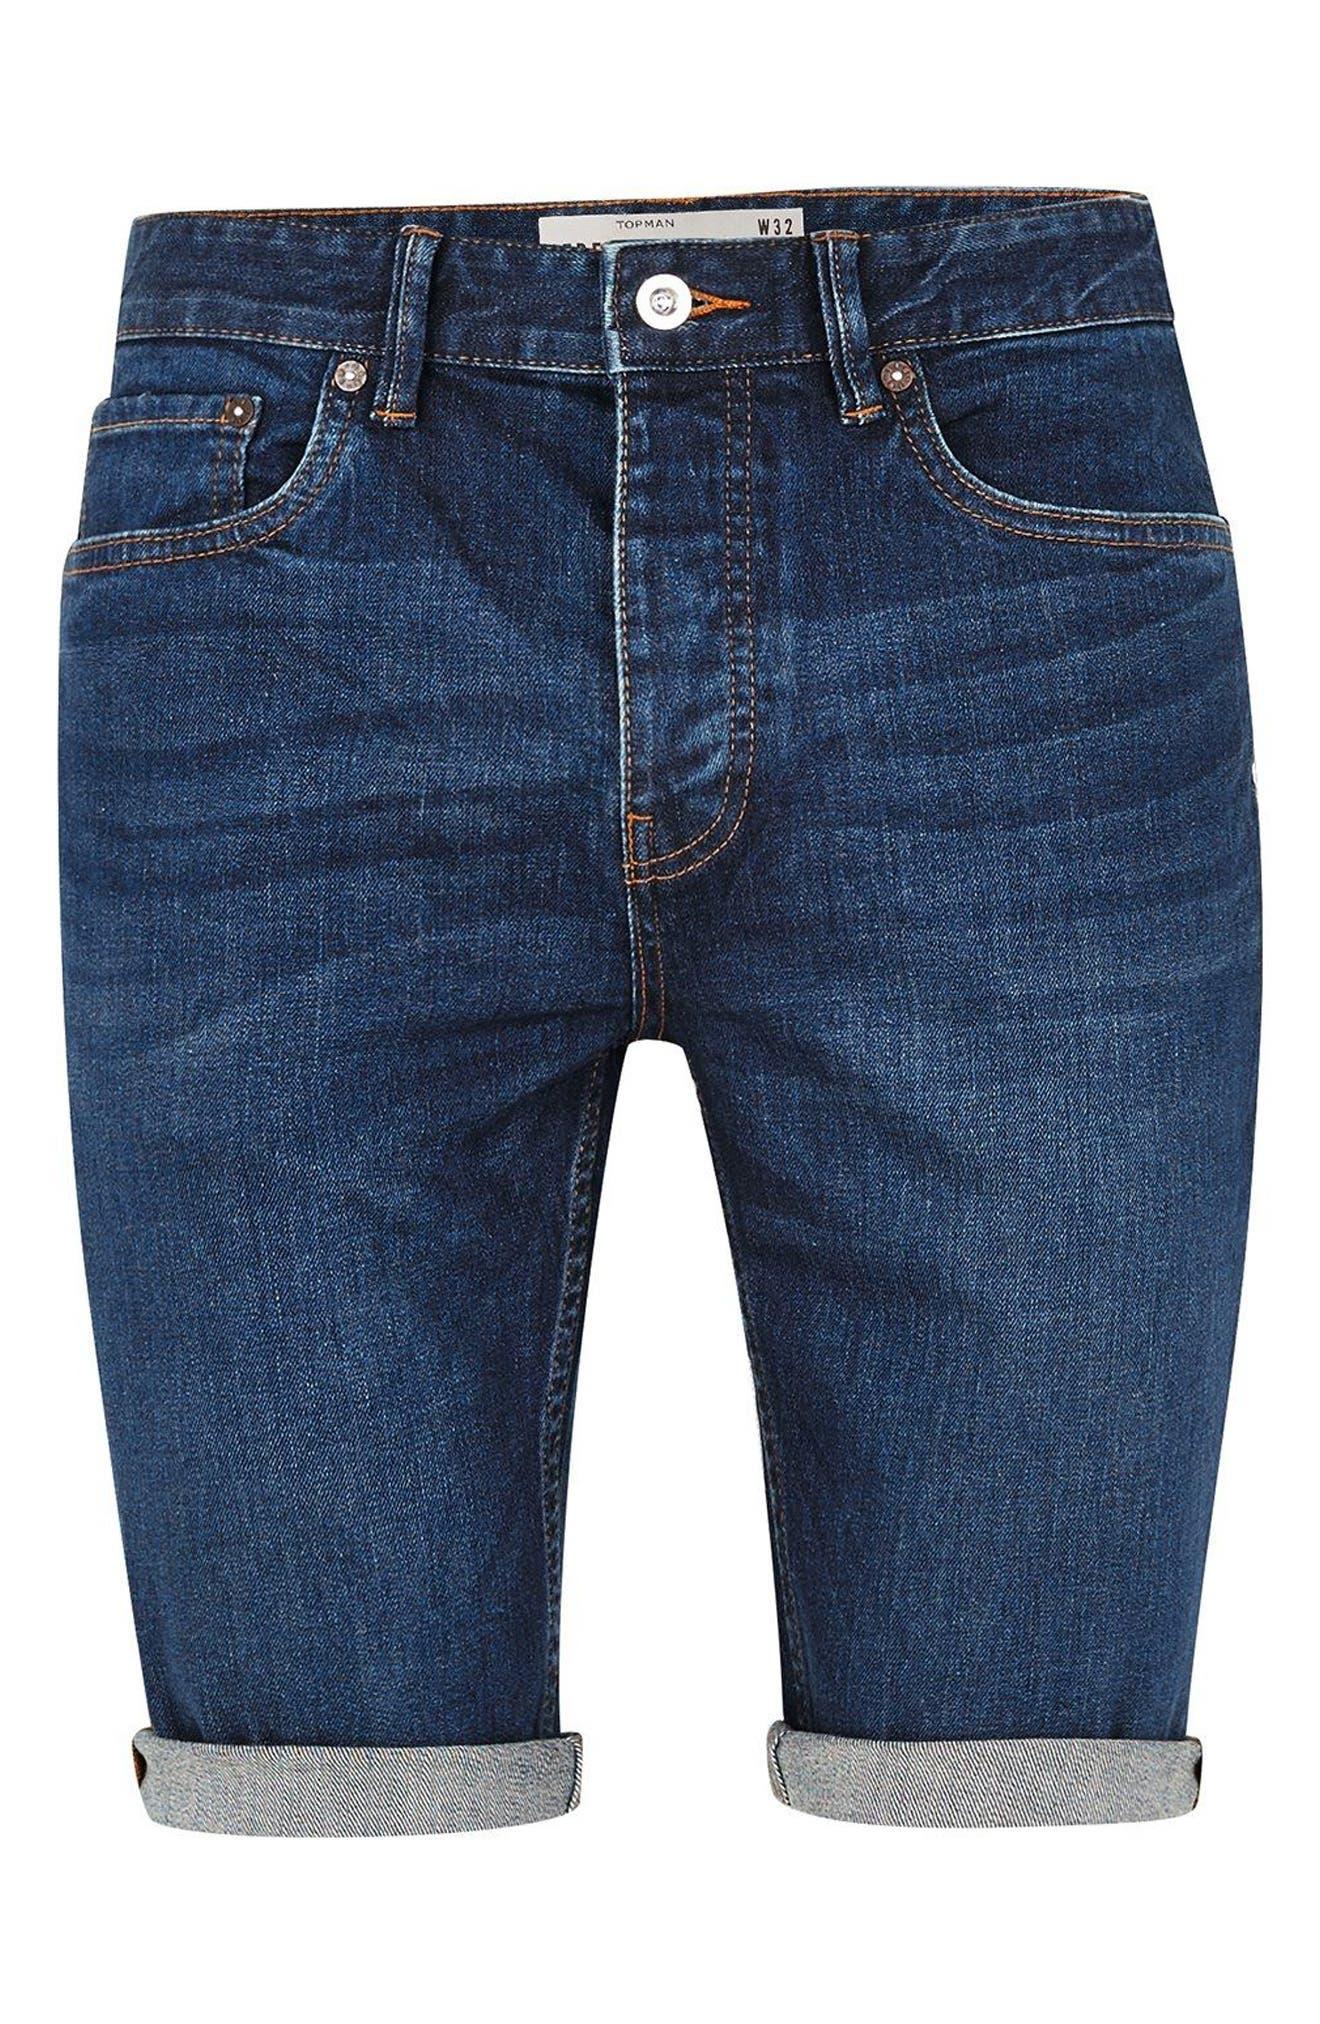 Skinny Fit Denim Shorts,                             Alternate thumbnail 4, color,                             BLUE